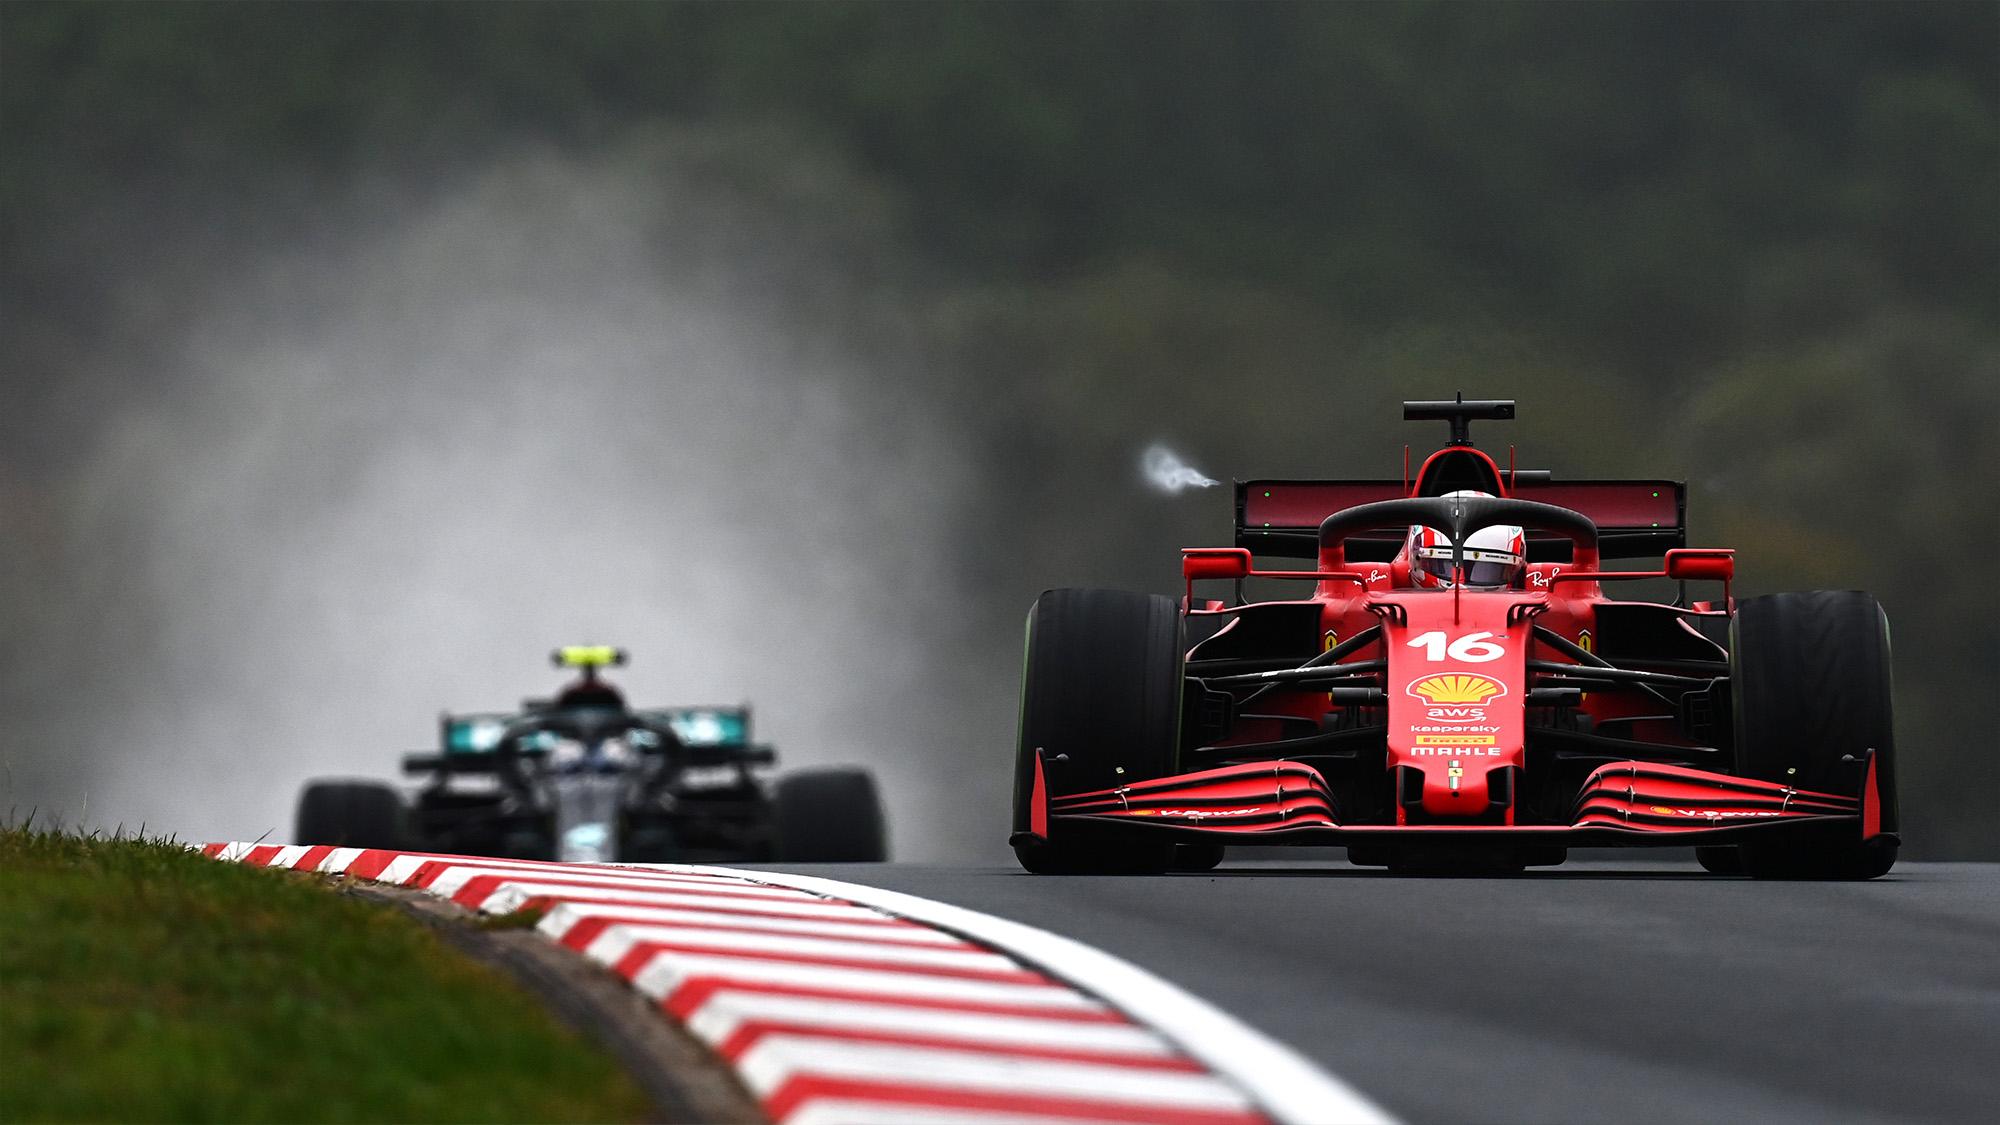 Charles Leclerc ahead of Val;tteri Bottas at the 2021 Turkish Grand Prix